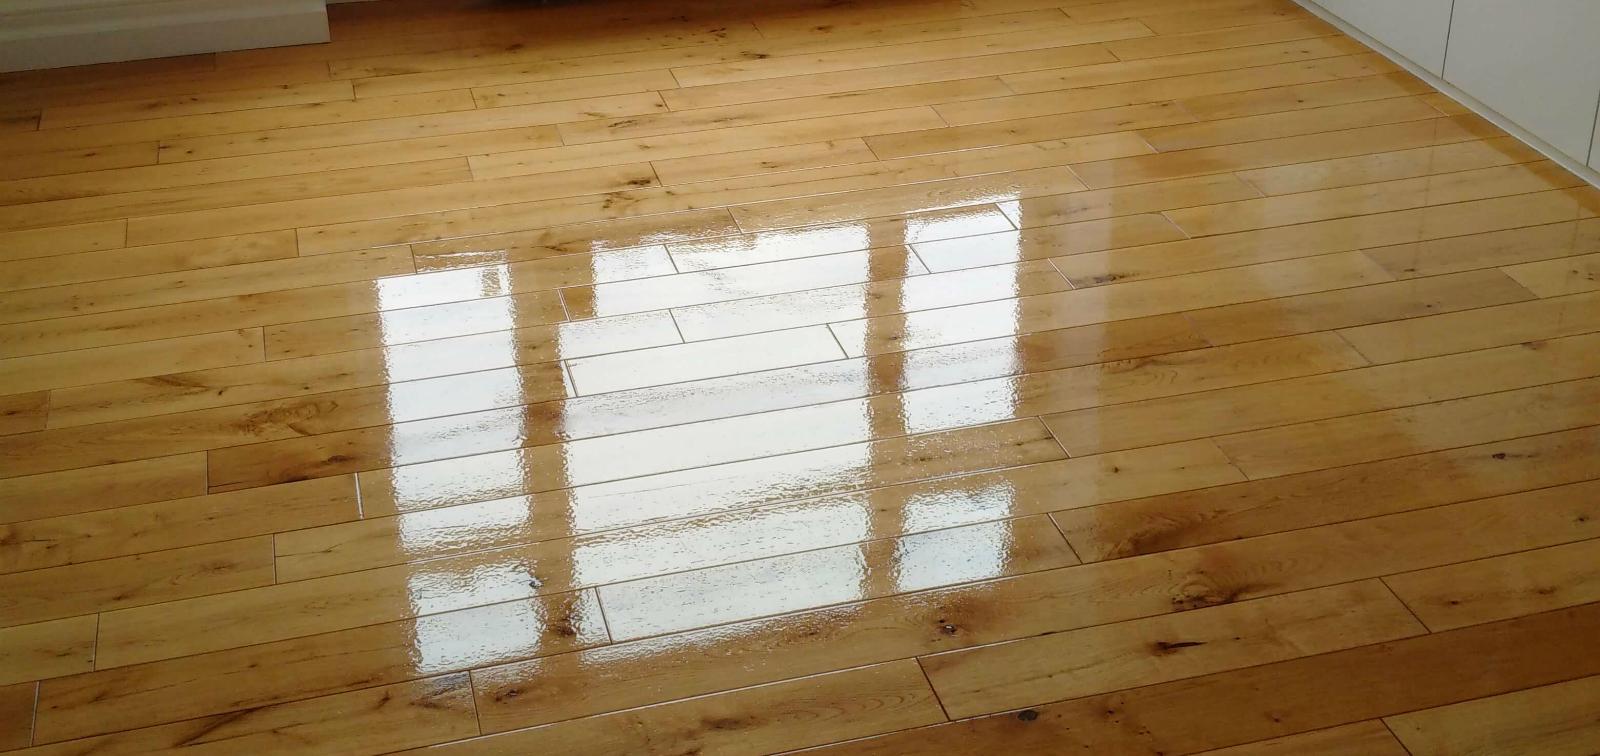 Light Sanding Wood Floor and Re-varnish